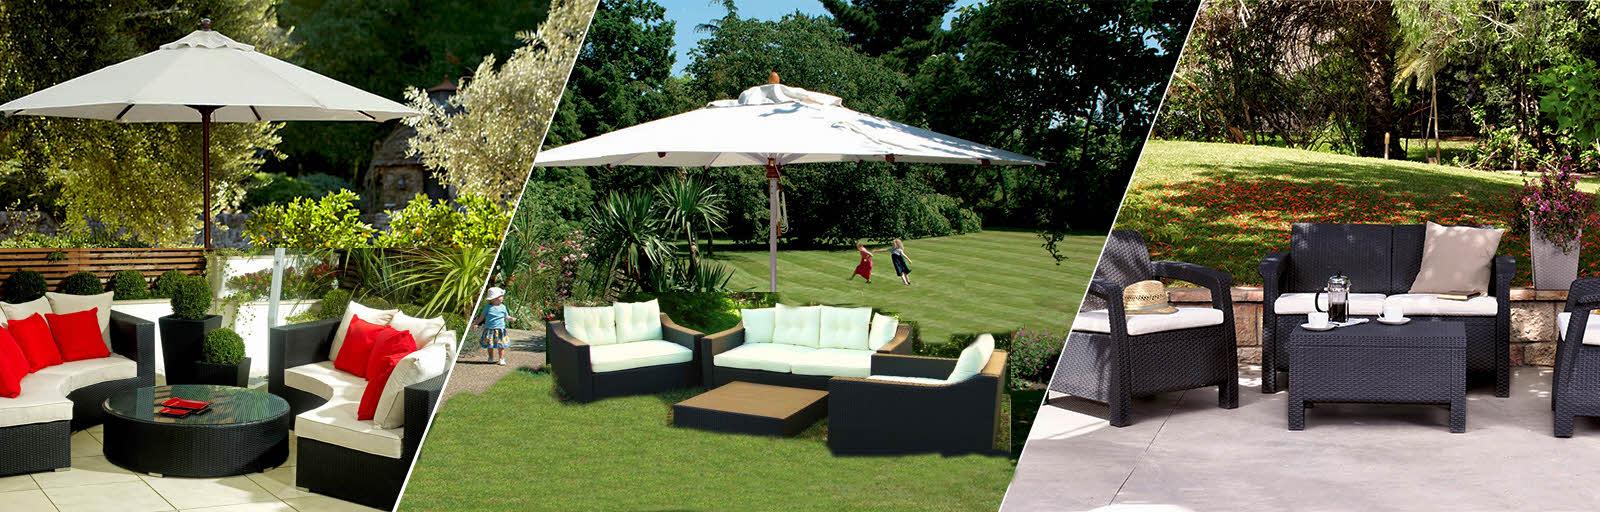 Korex World Outdoor Furniture In Delhi Delhi